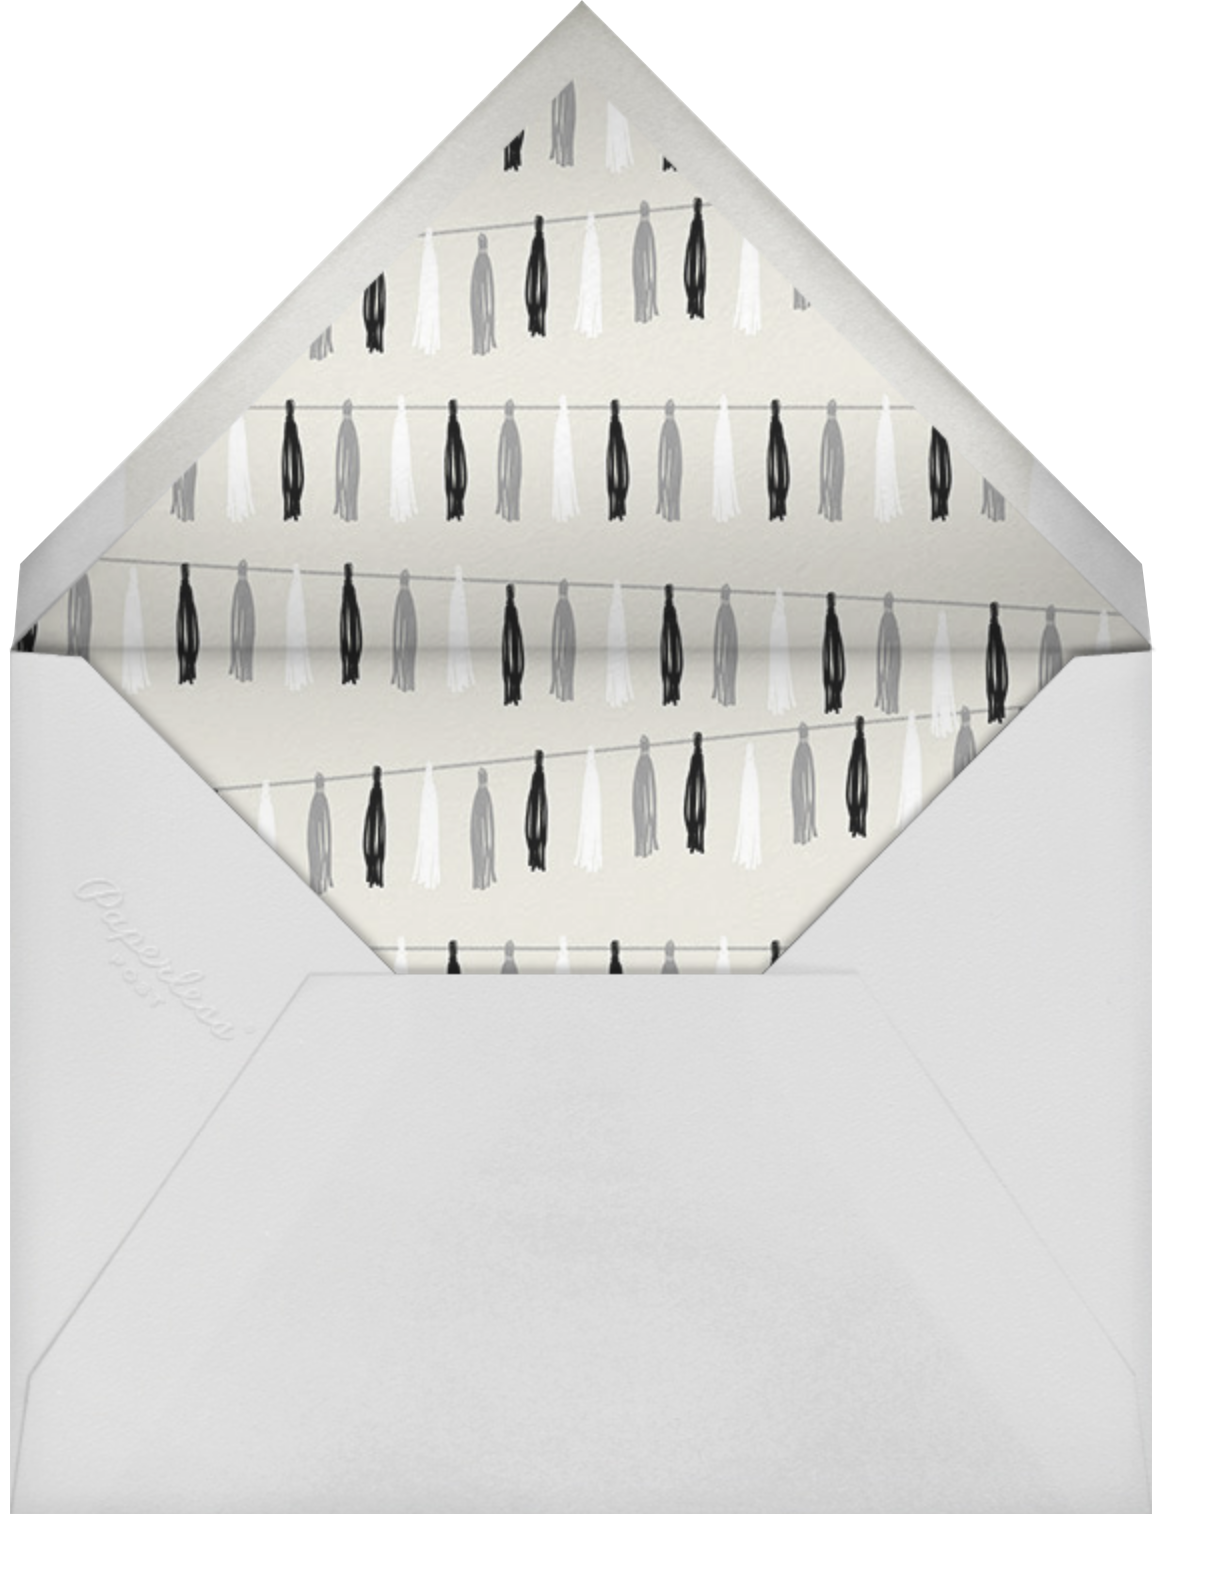 Tasseled II - Rose Gold - Paperless Post - Graduation party - envelope back